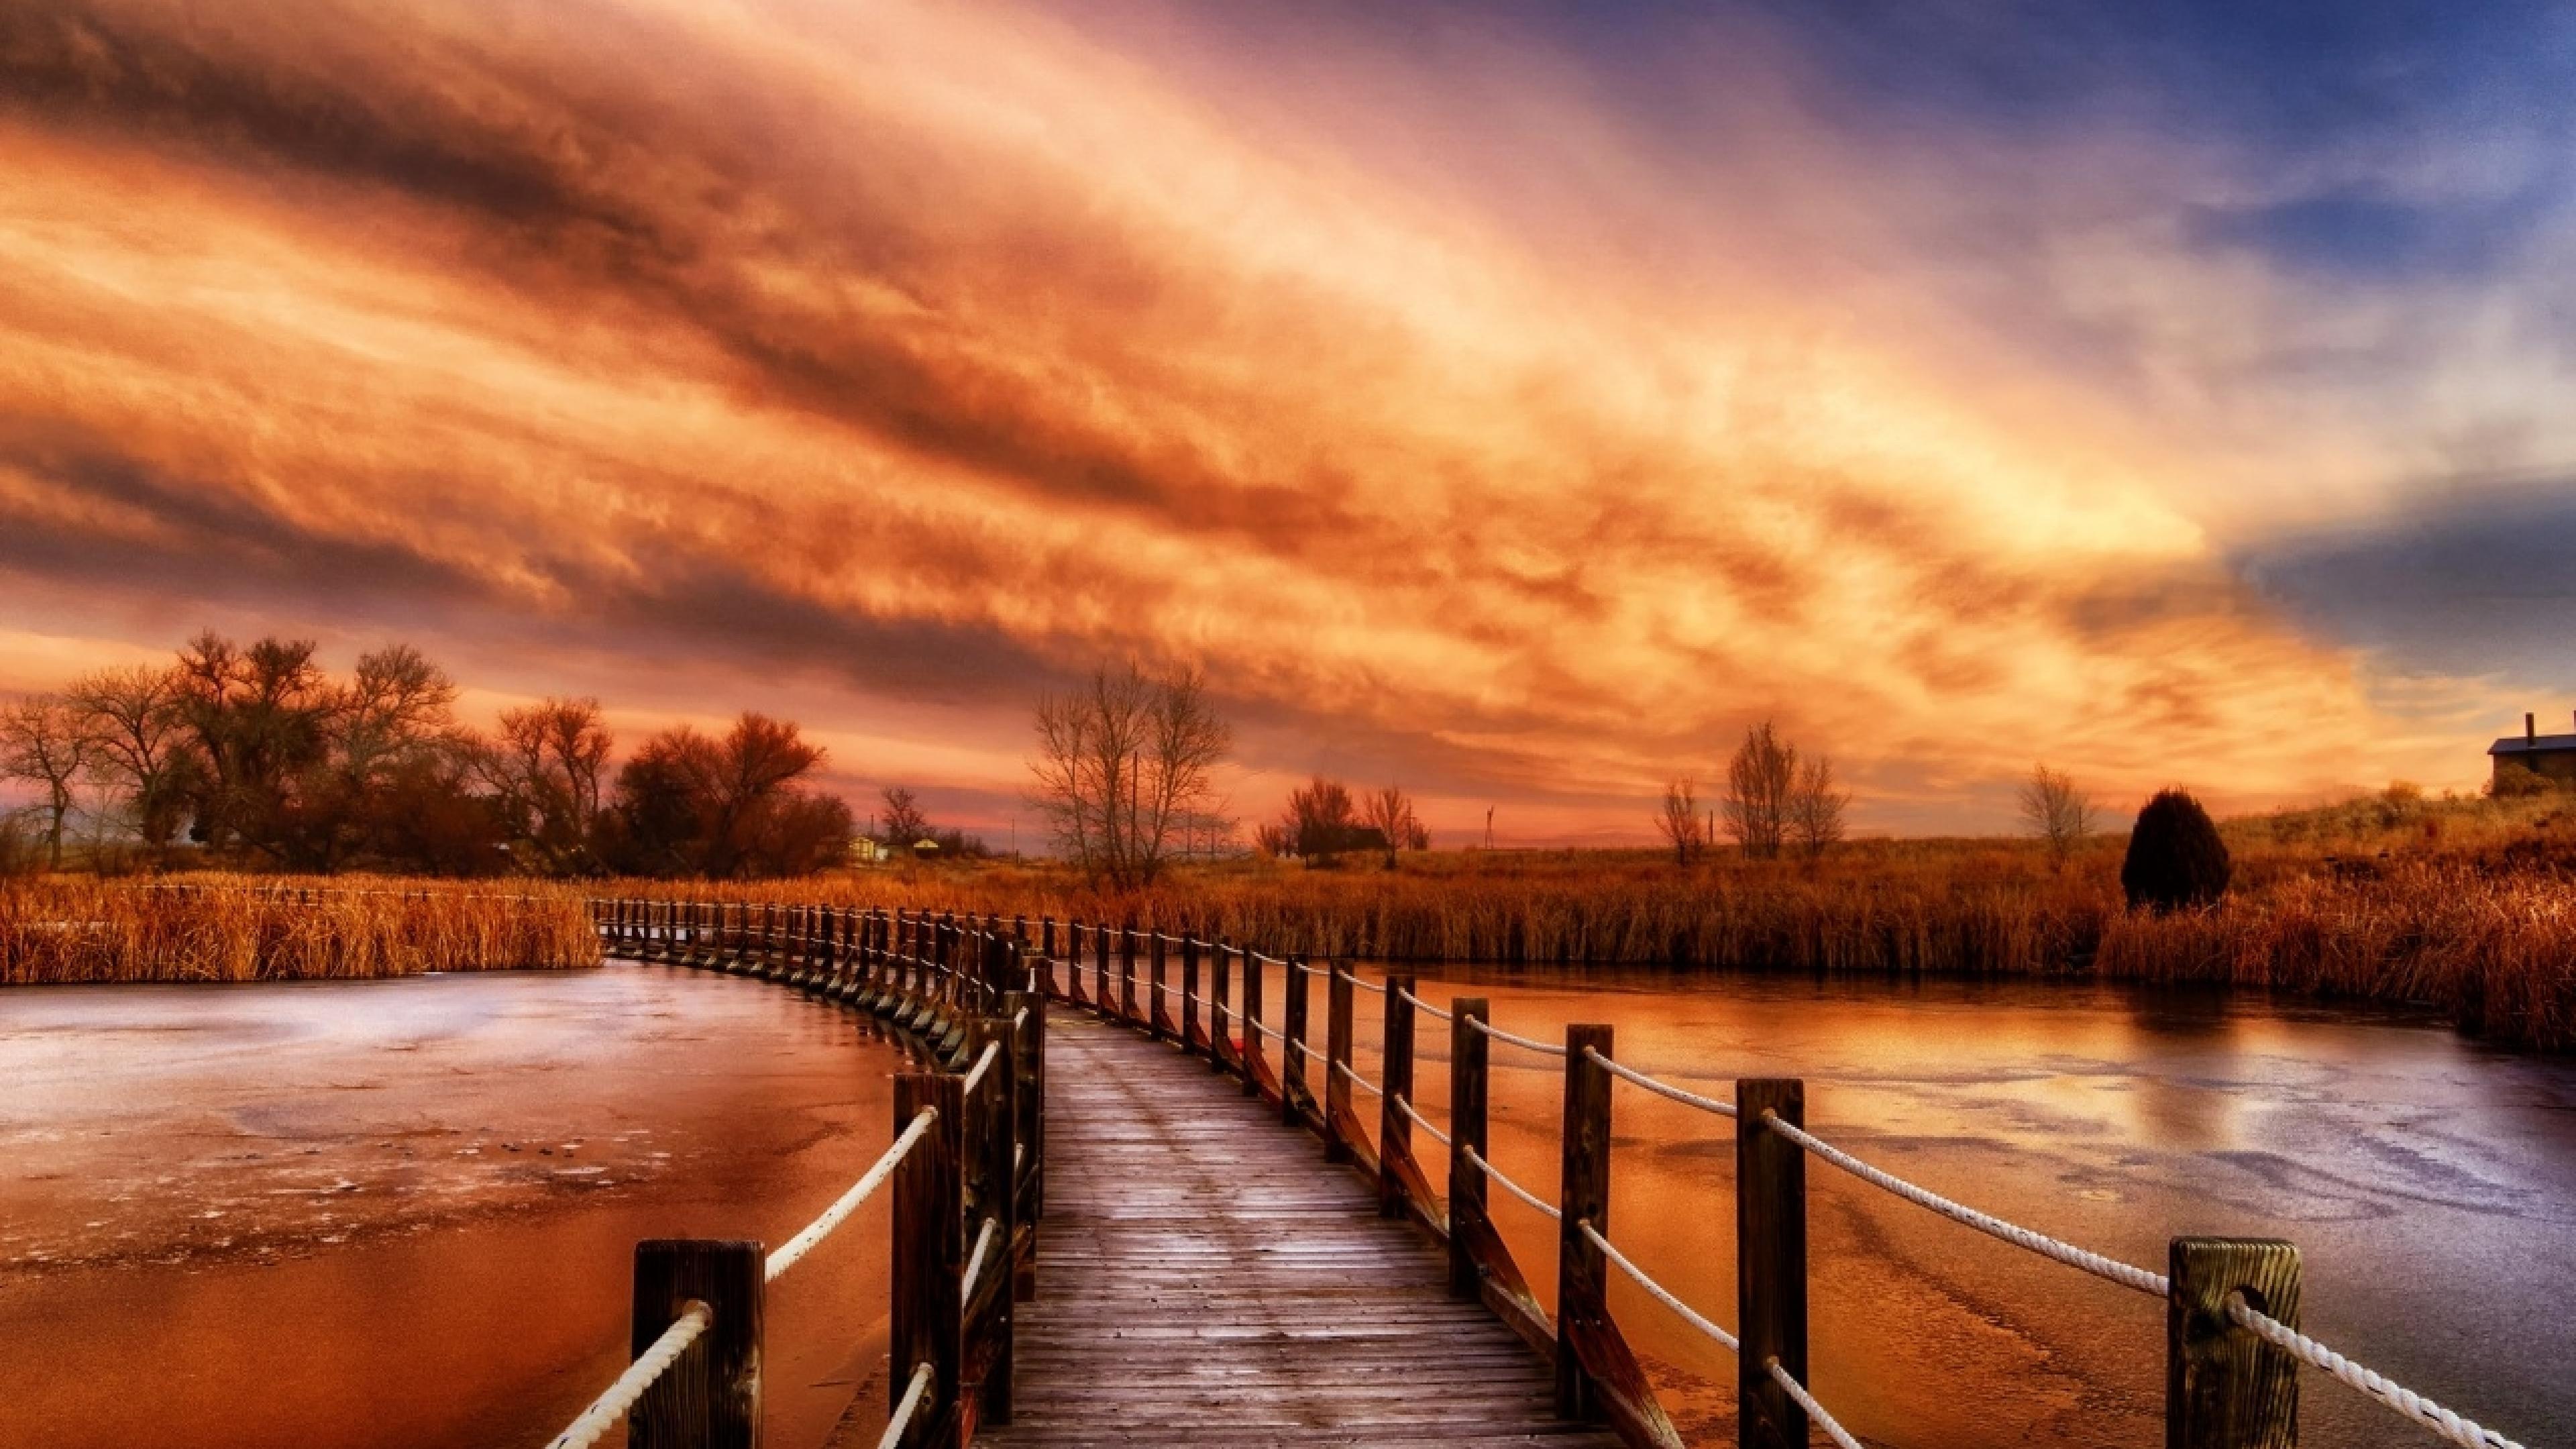 Windows 10 Fall Usa Wallpapers 4k Autumn River Sky Wooden Bridge Ultra Hd 3840x2160